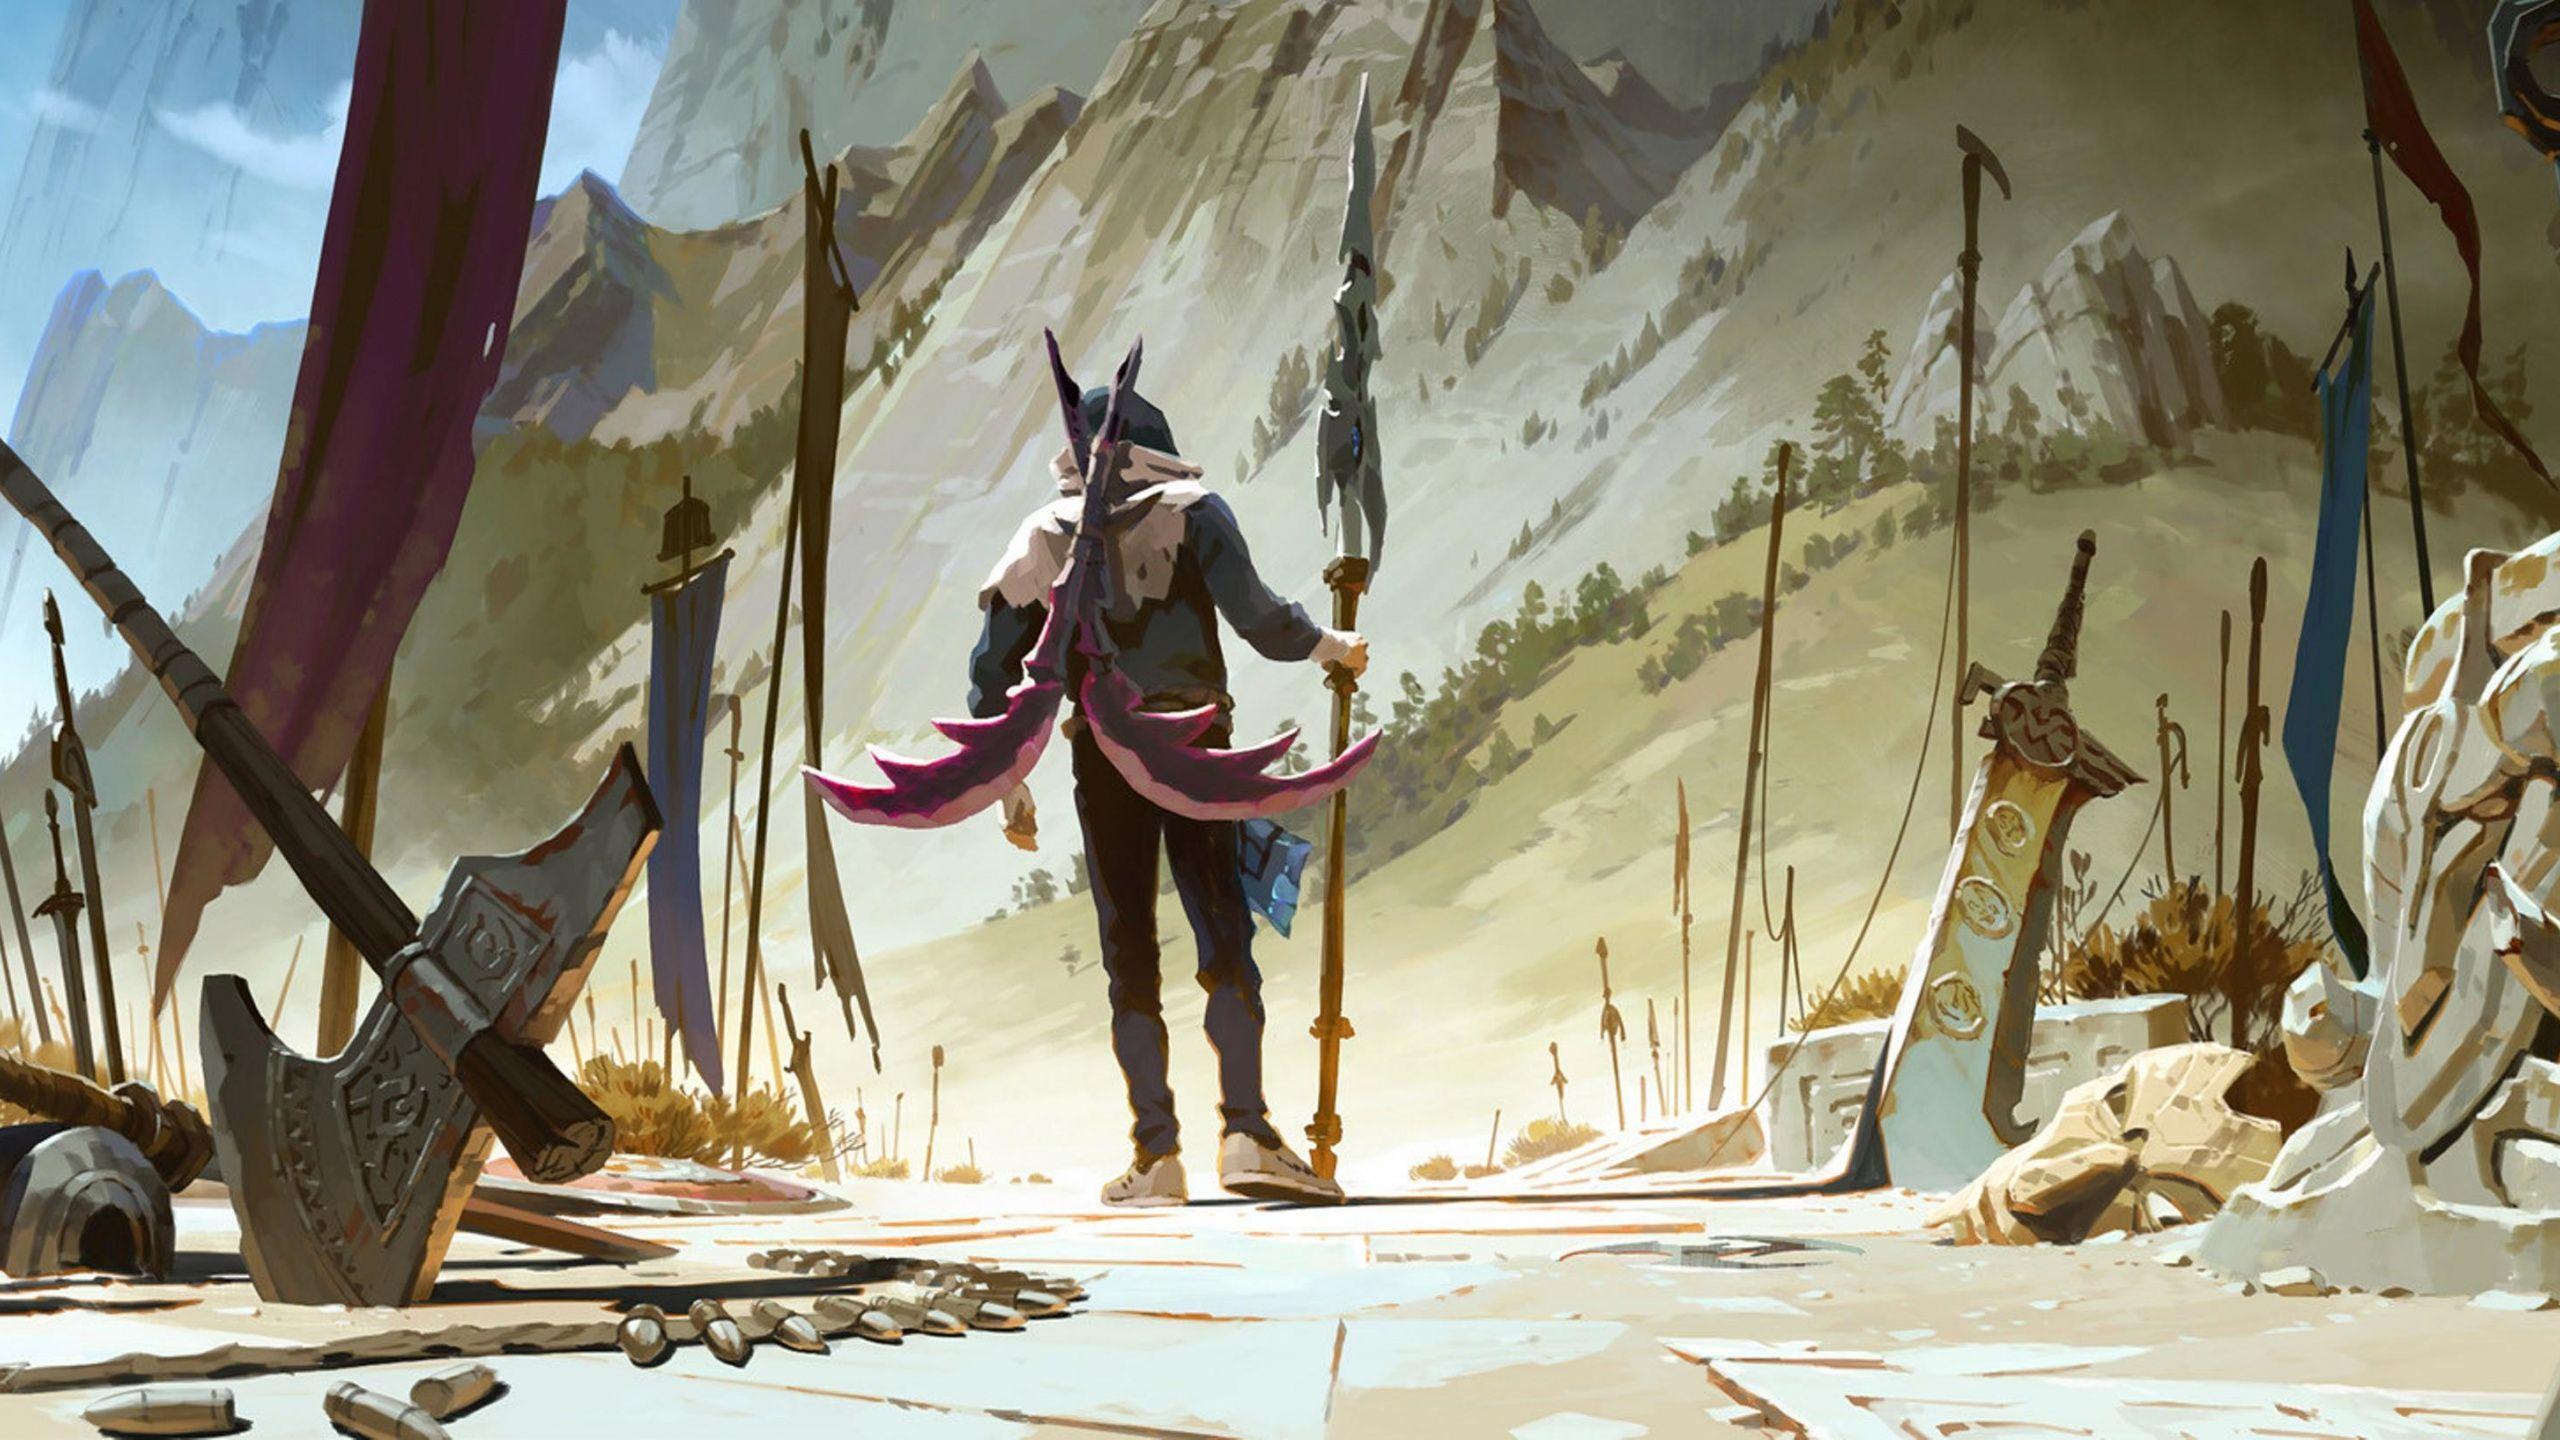 2560x1440 Rise Warrior League Of Legends Wallpaper In 2020 League Of Legends Rise Art Environment Concept Art